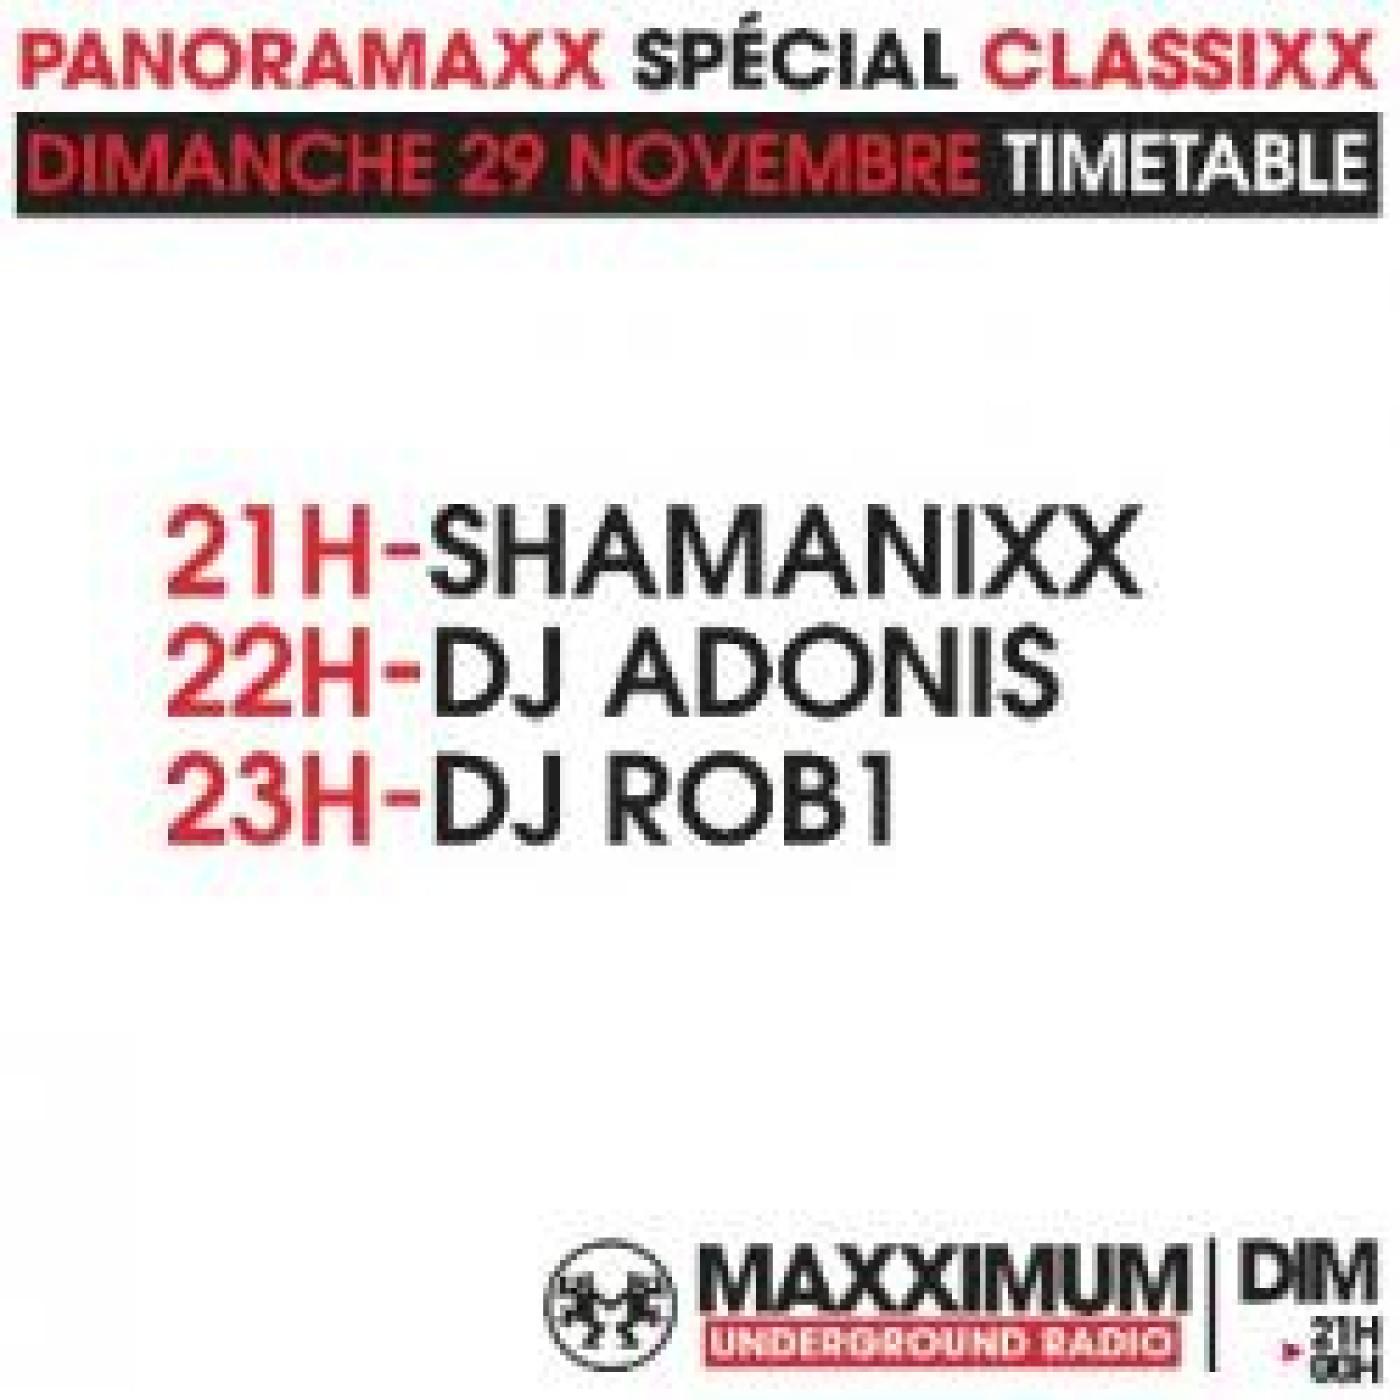 PANORAMAXX CLASSIXX : ADONIS